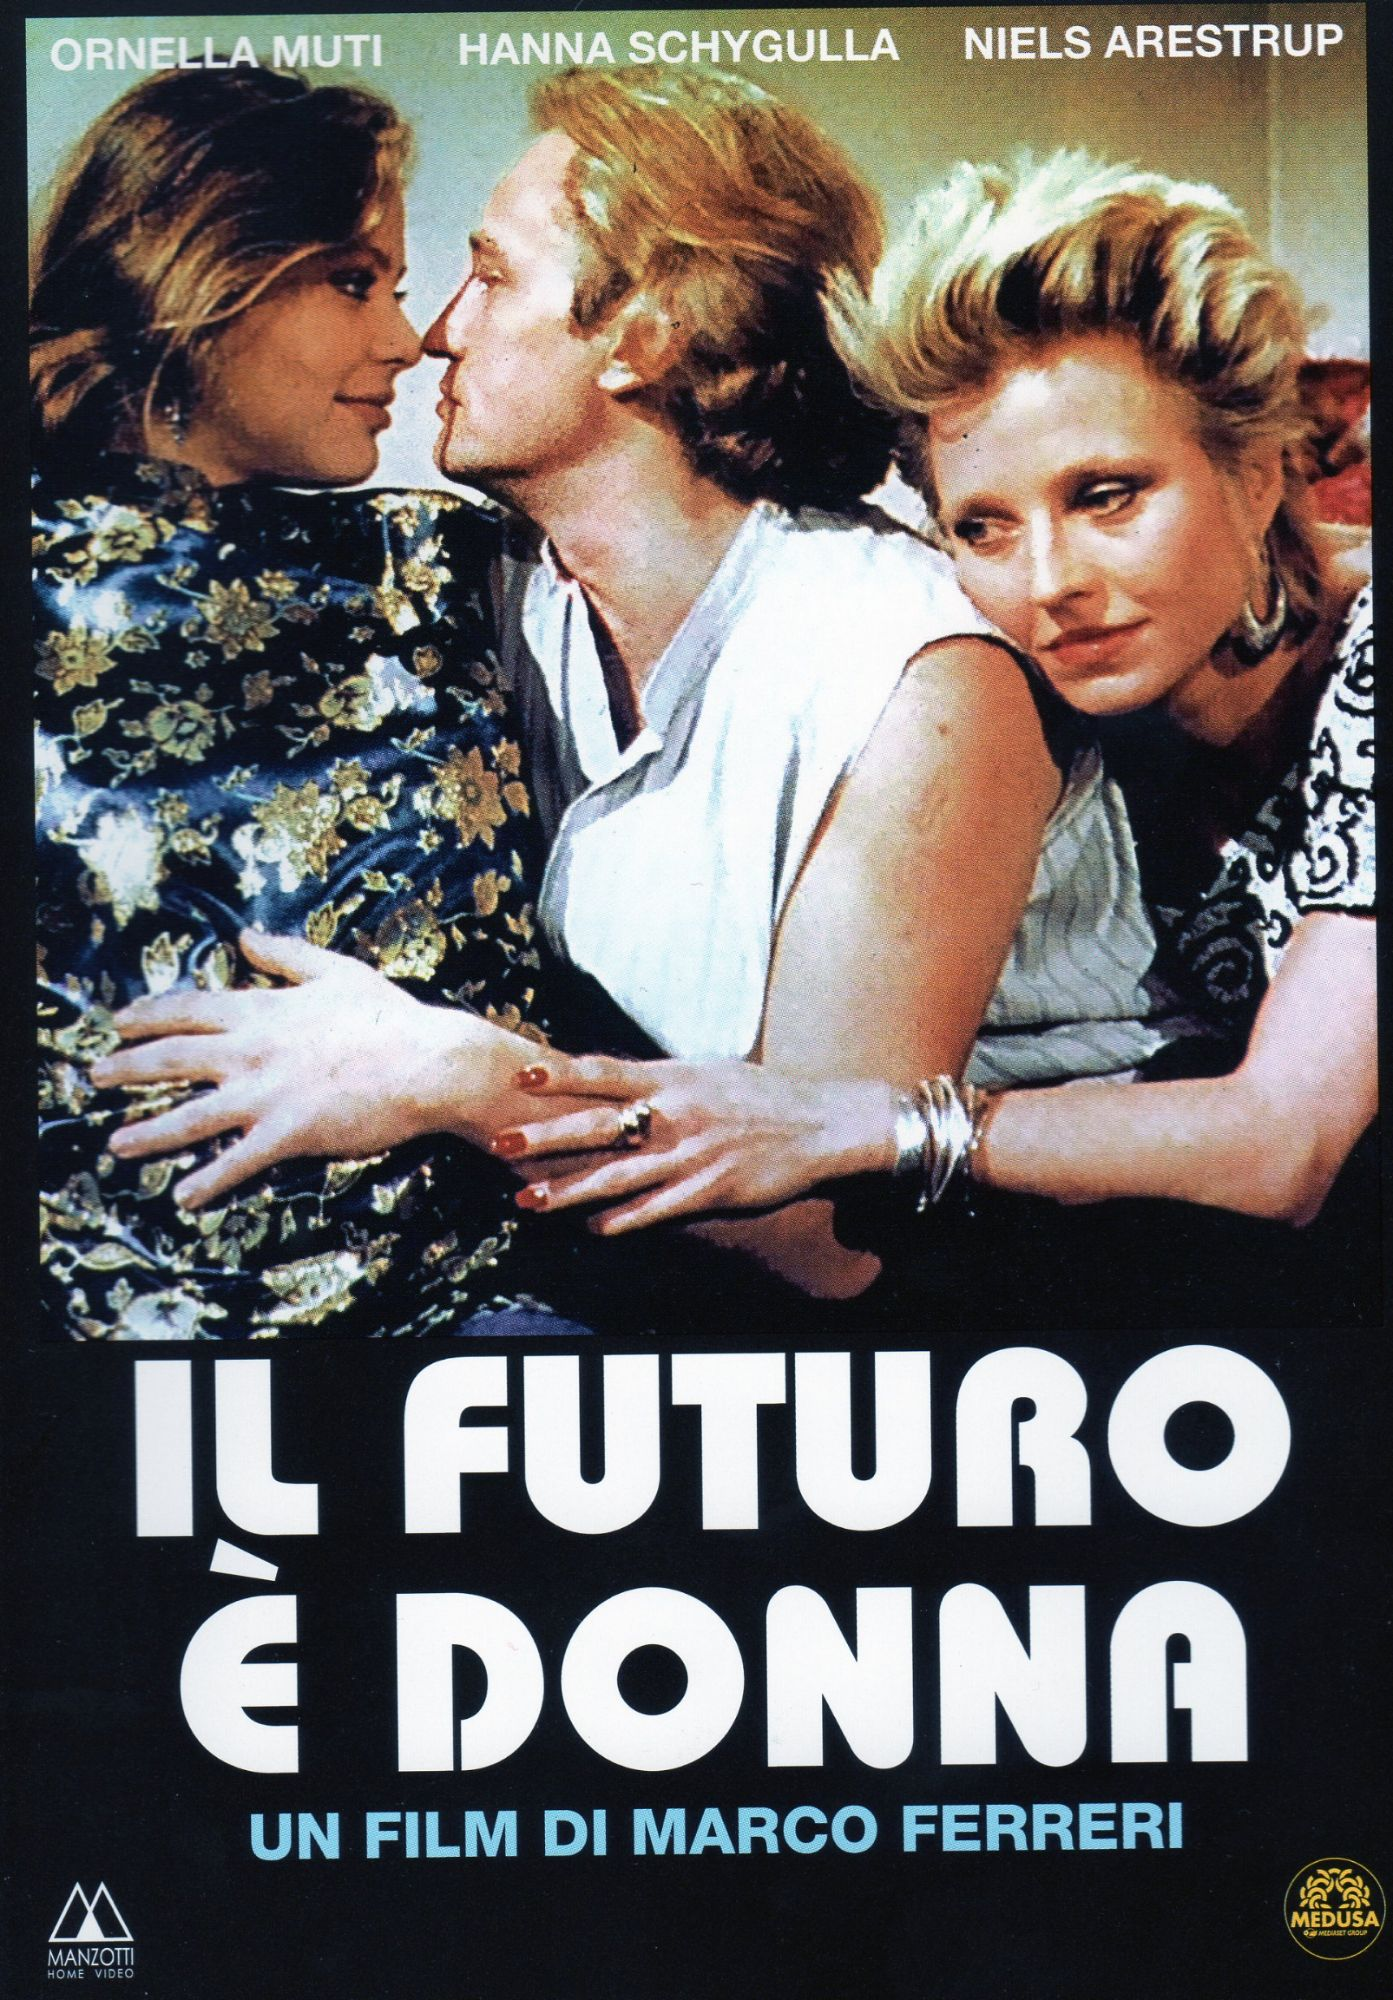 Год выпуска 1984 Страна Италия / Франция / Германия Жанр Драма